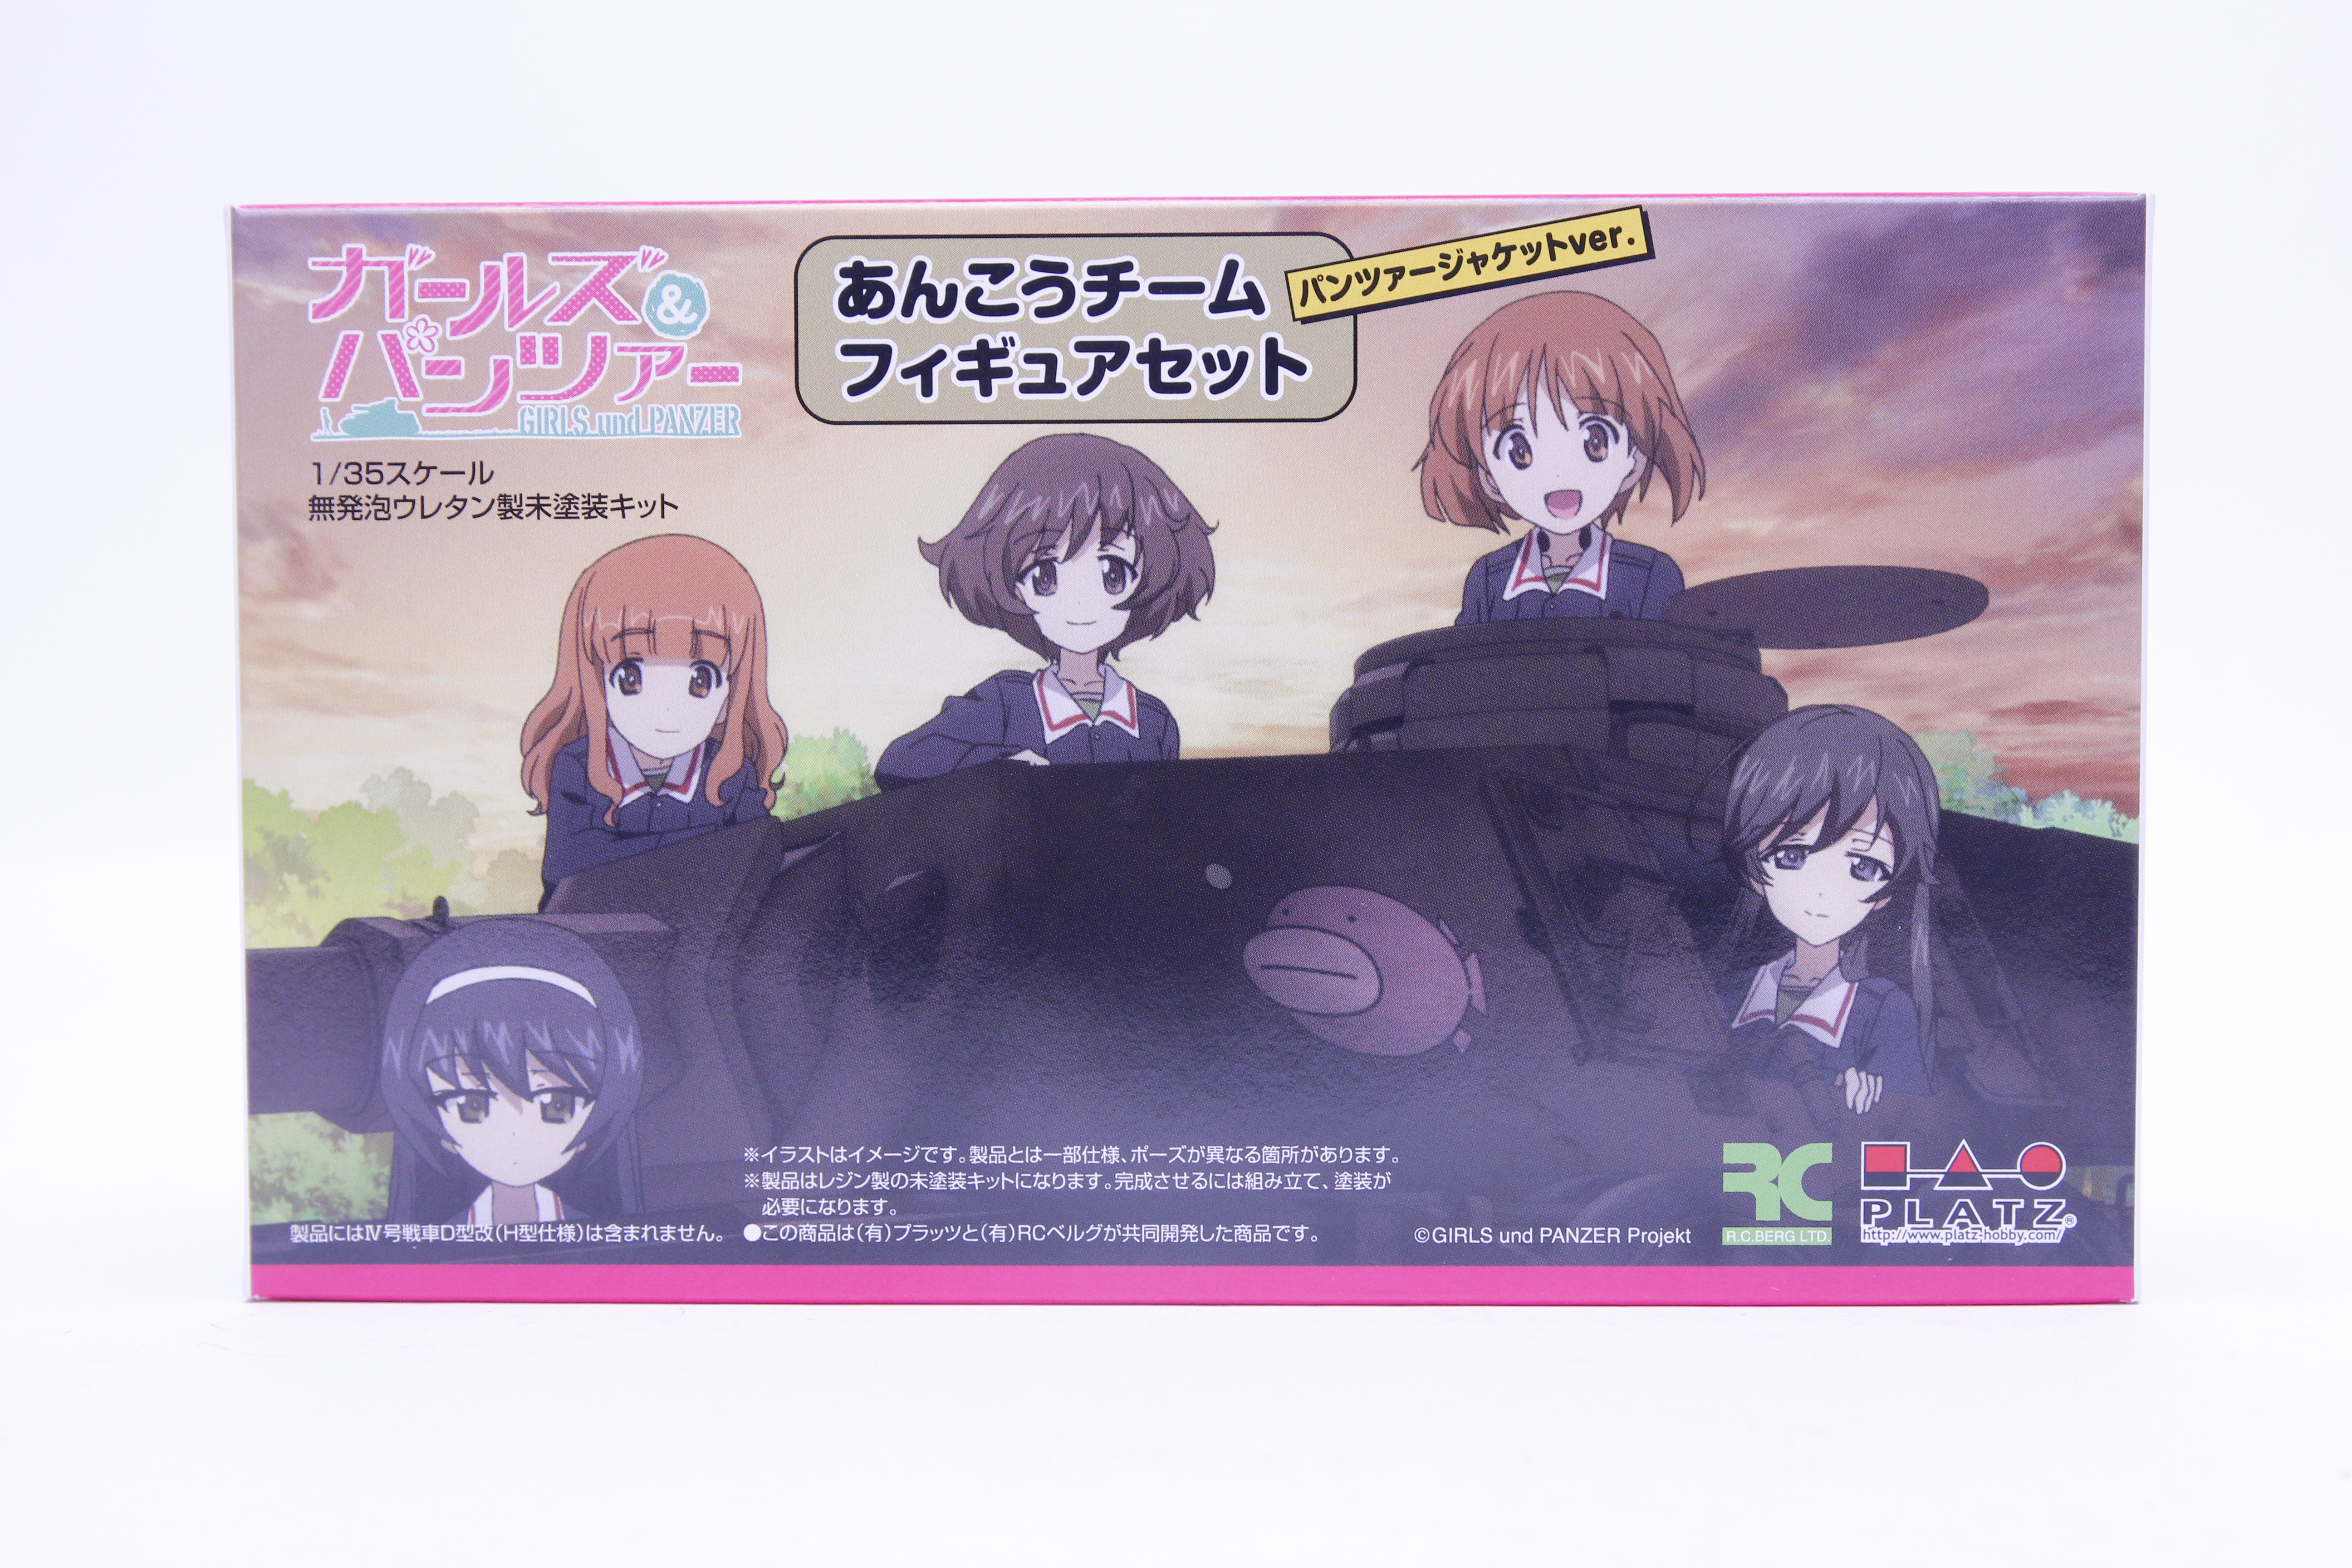 Platz x R.C. 1/35 GIRLS und PANZER TEAM ANKOU PANZER JAKET Ver. Figure Kit set (Tank not included)